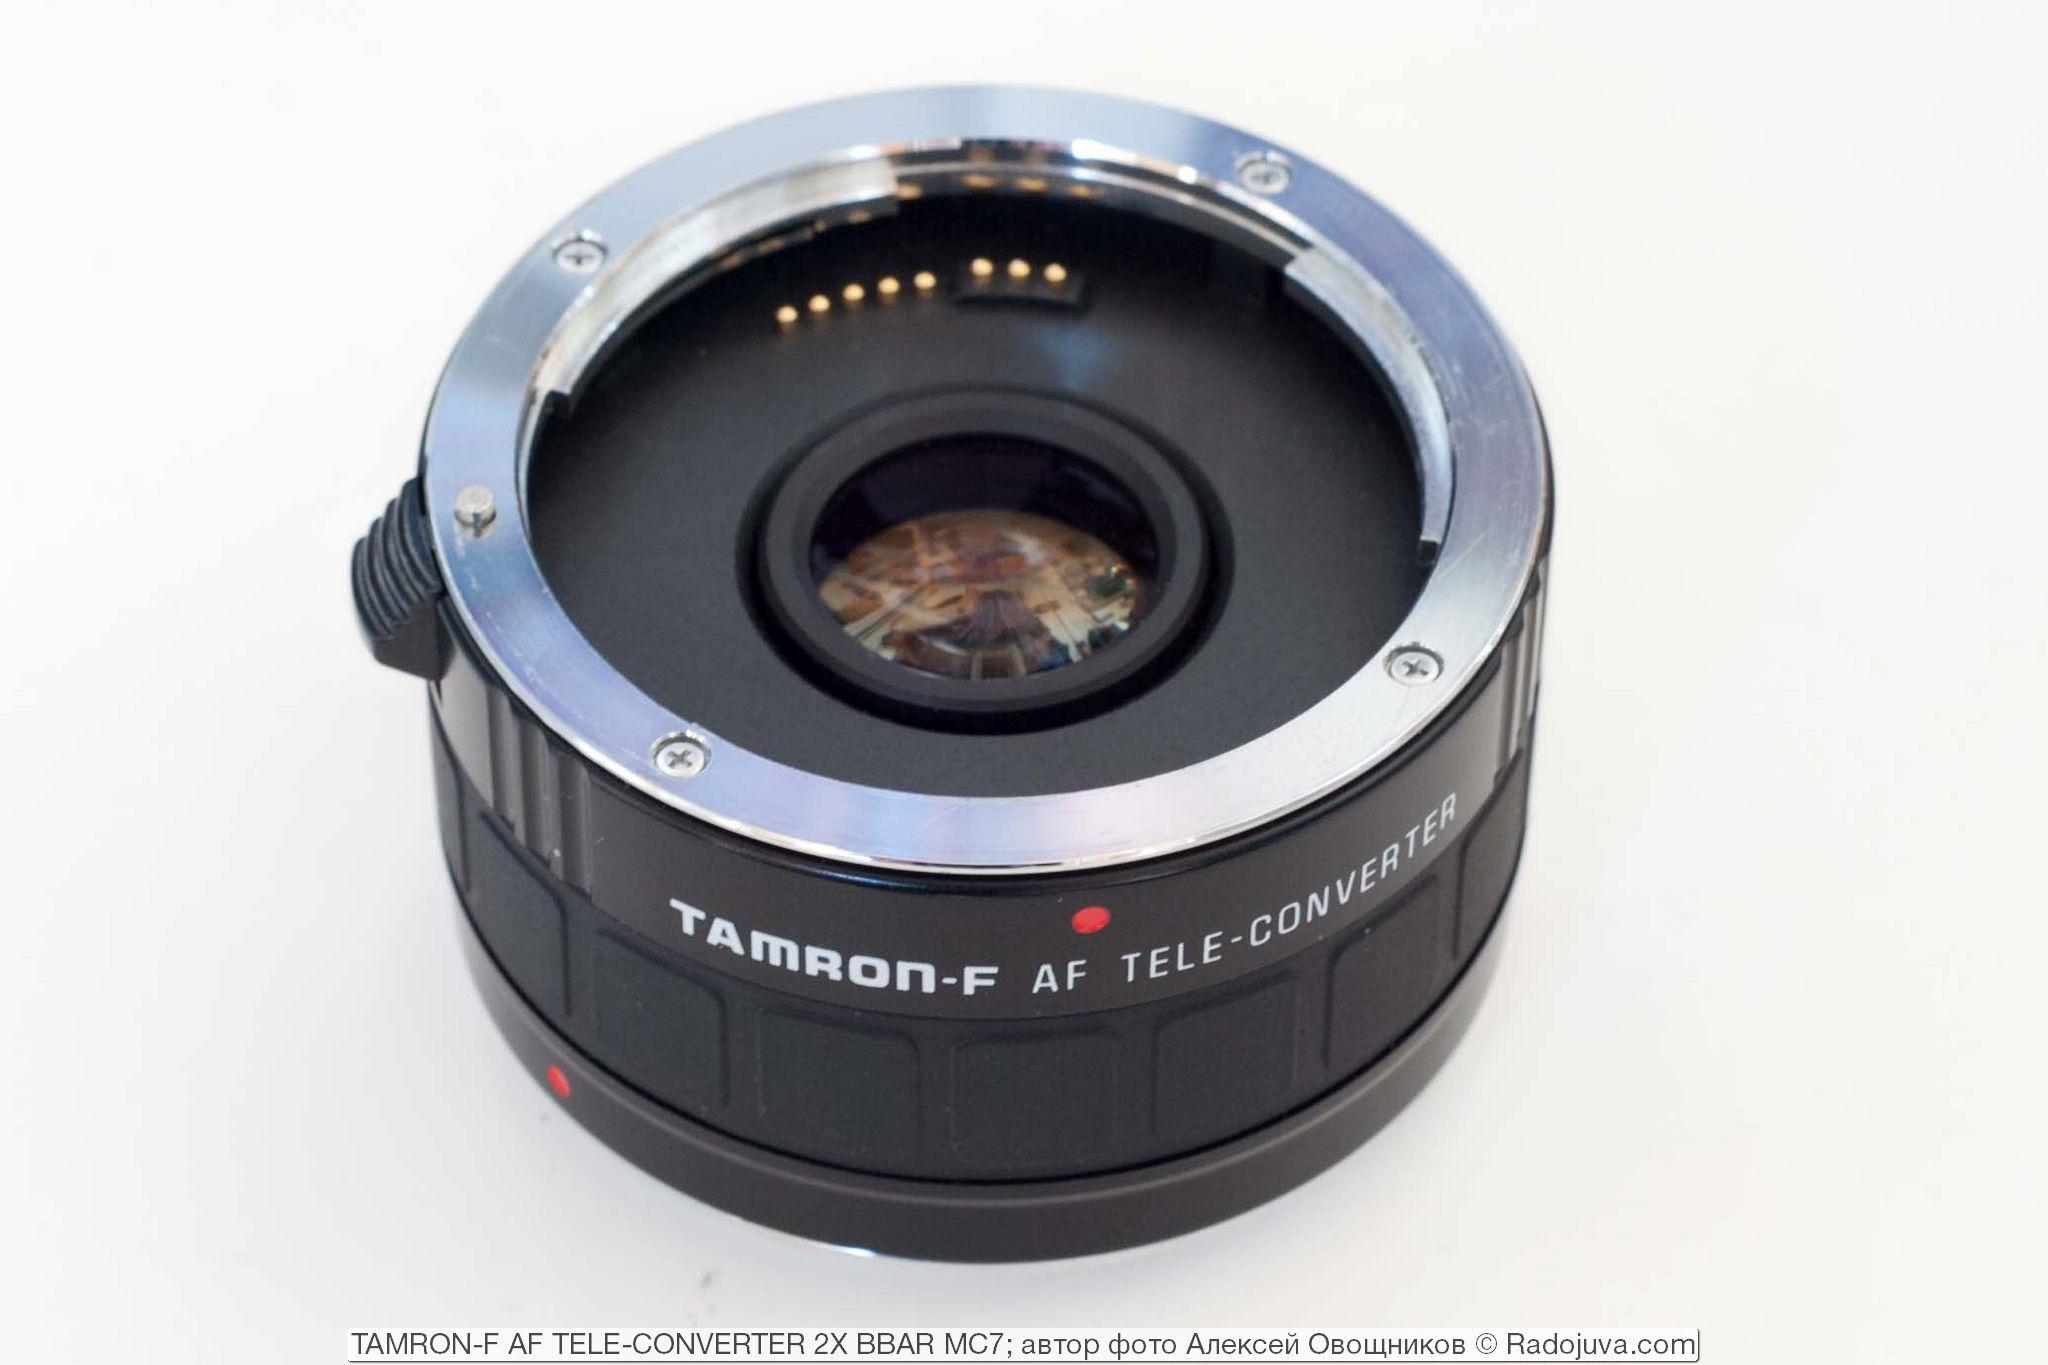 TAMRON-F AF TELE-CONVERTER 2X BBAR MC7